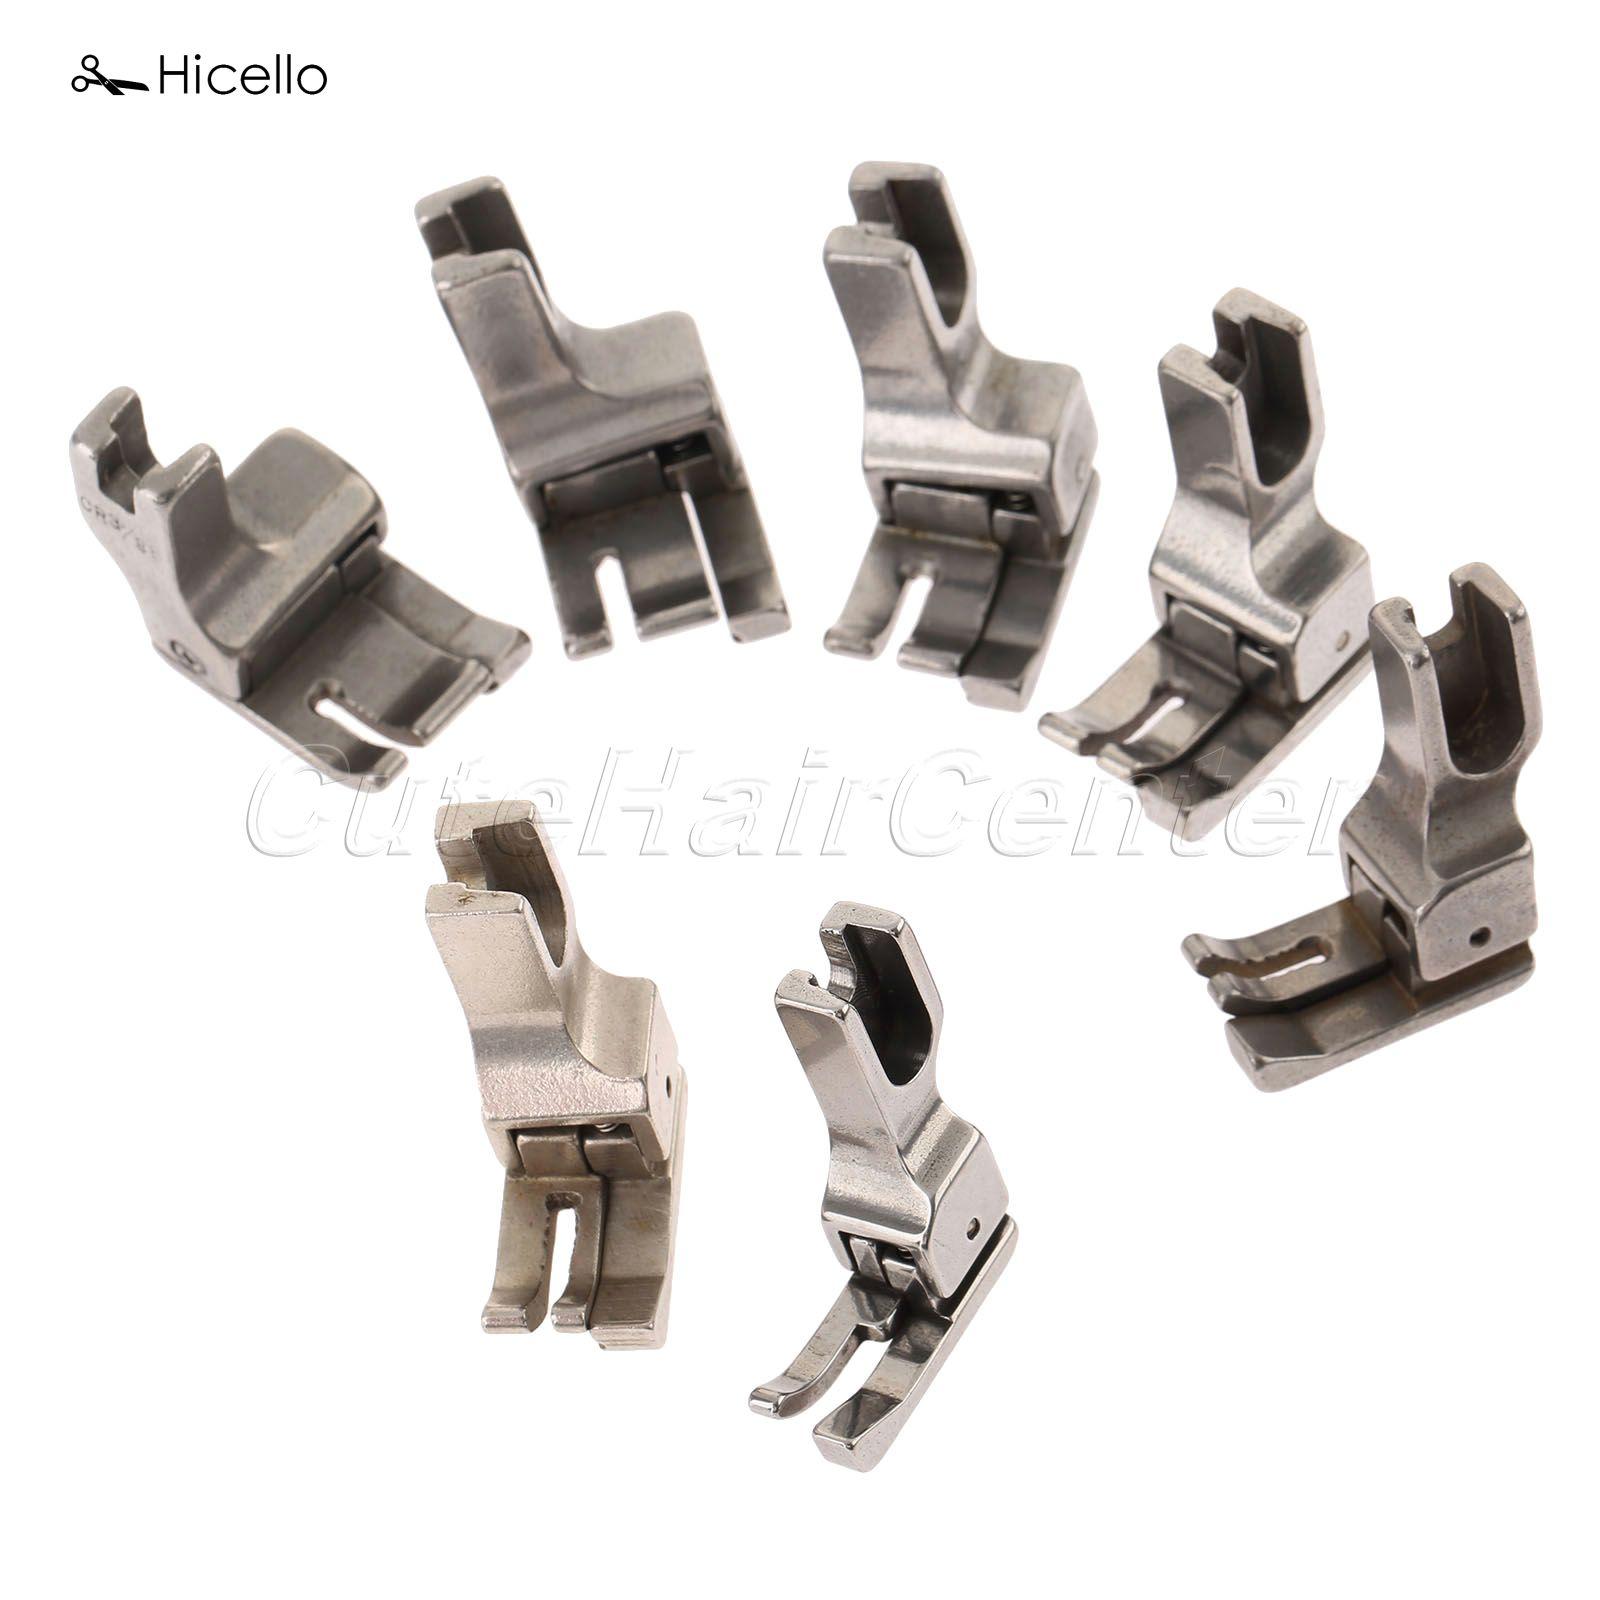 1PC Industrial Presser Foot Sewing Machine Full Steel RIGHT & WIDE Presser Foot 1.6mm/3.2mm/4mm/4.8mm.6.4mm/8mm/9.5mm costura